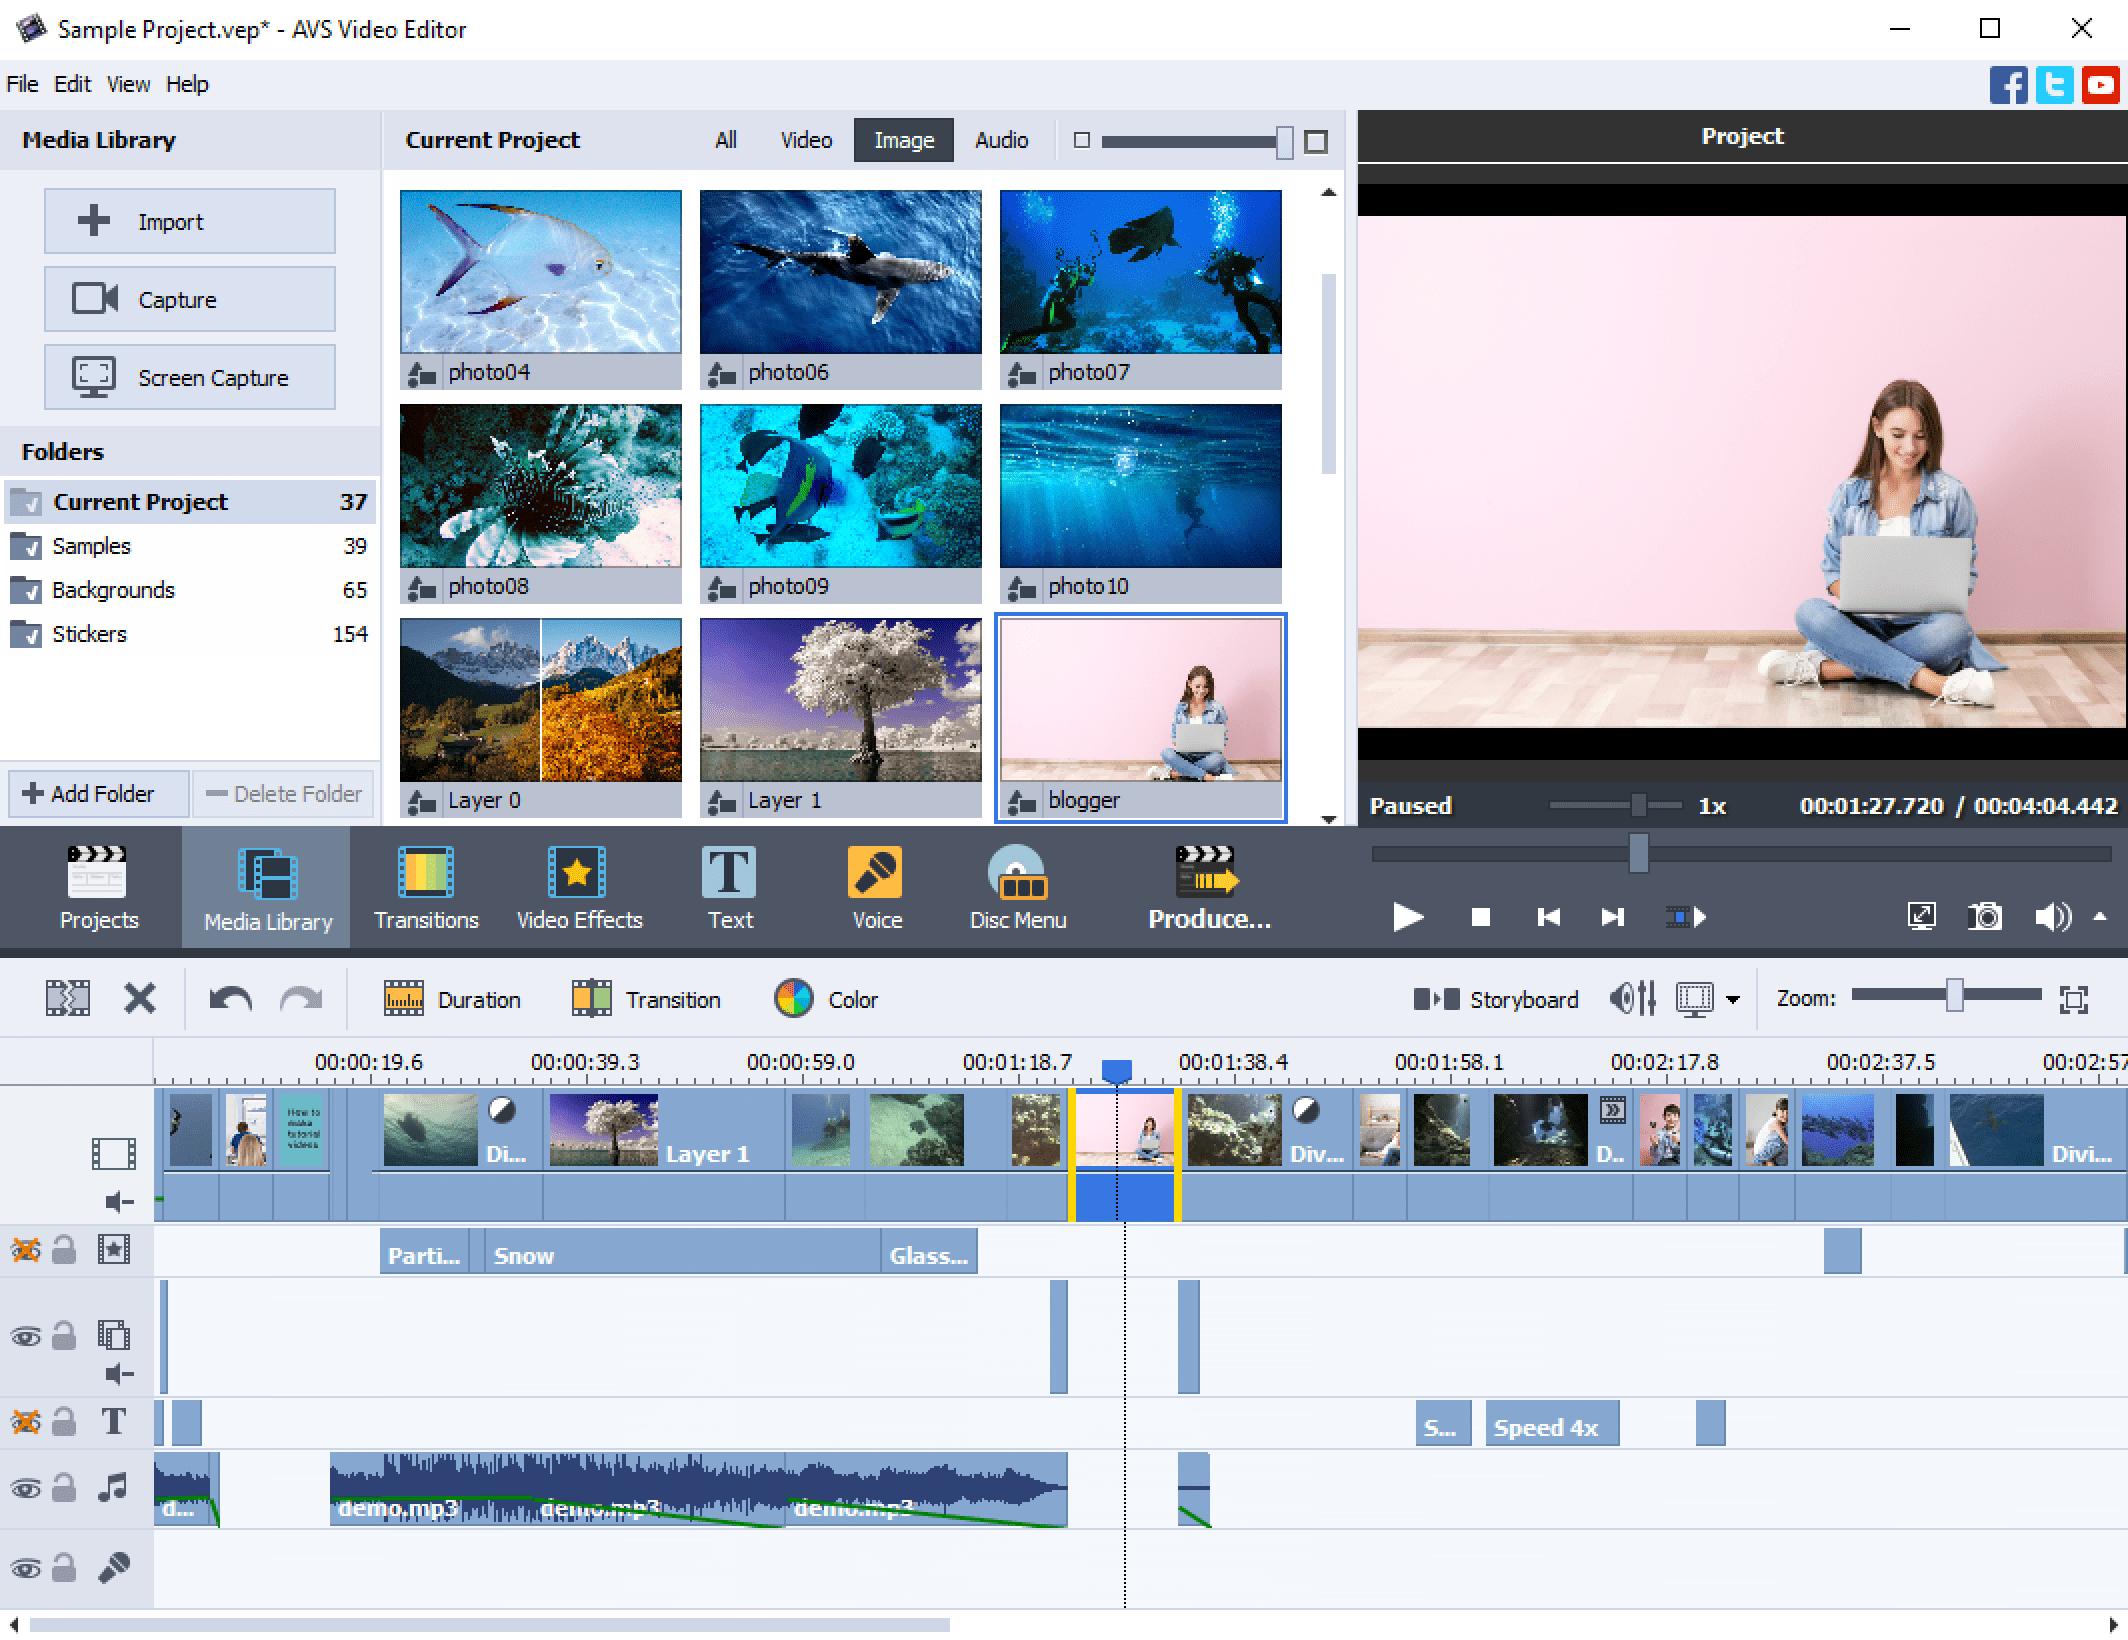 AVS Video Editor - Main Window